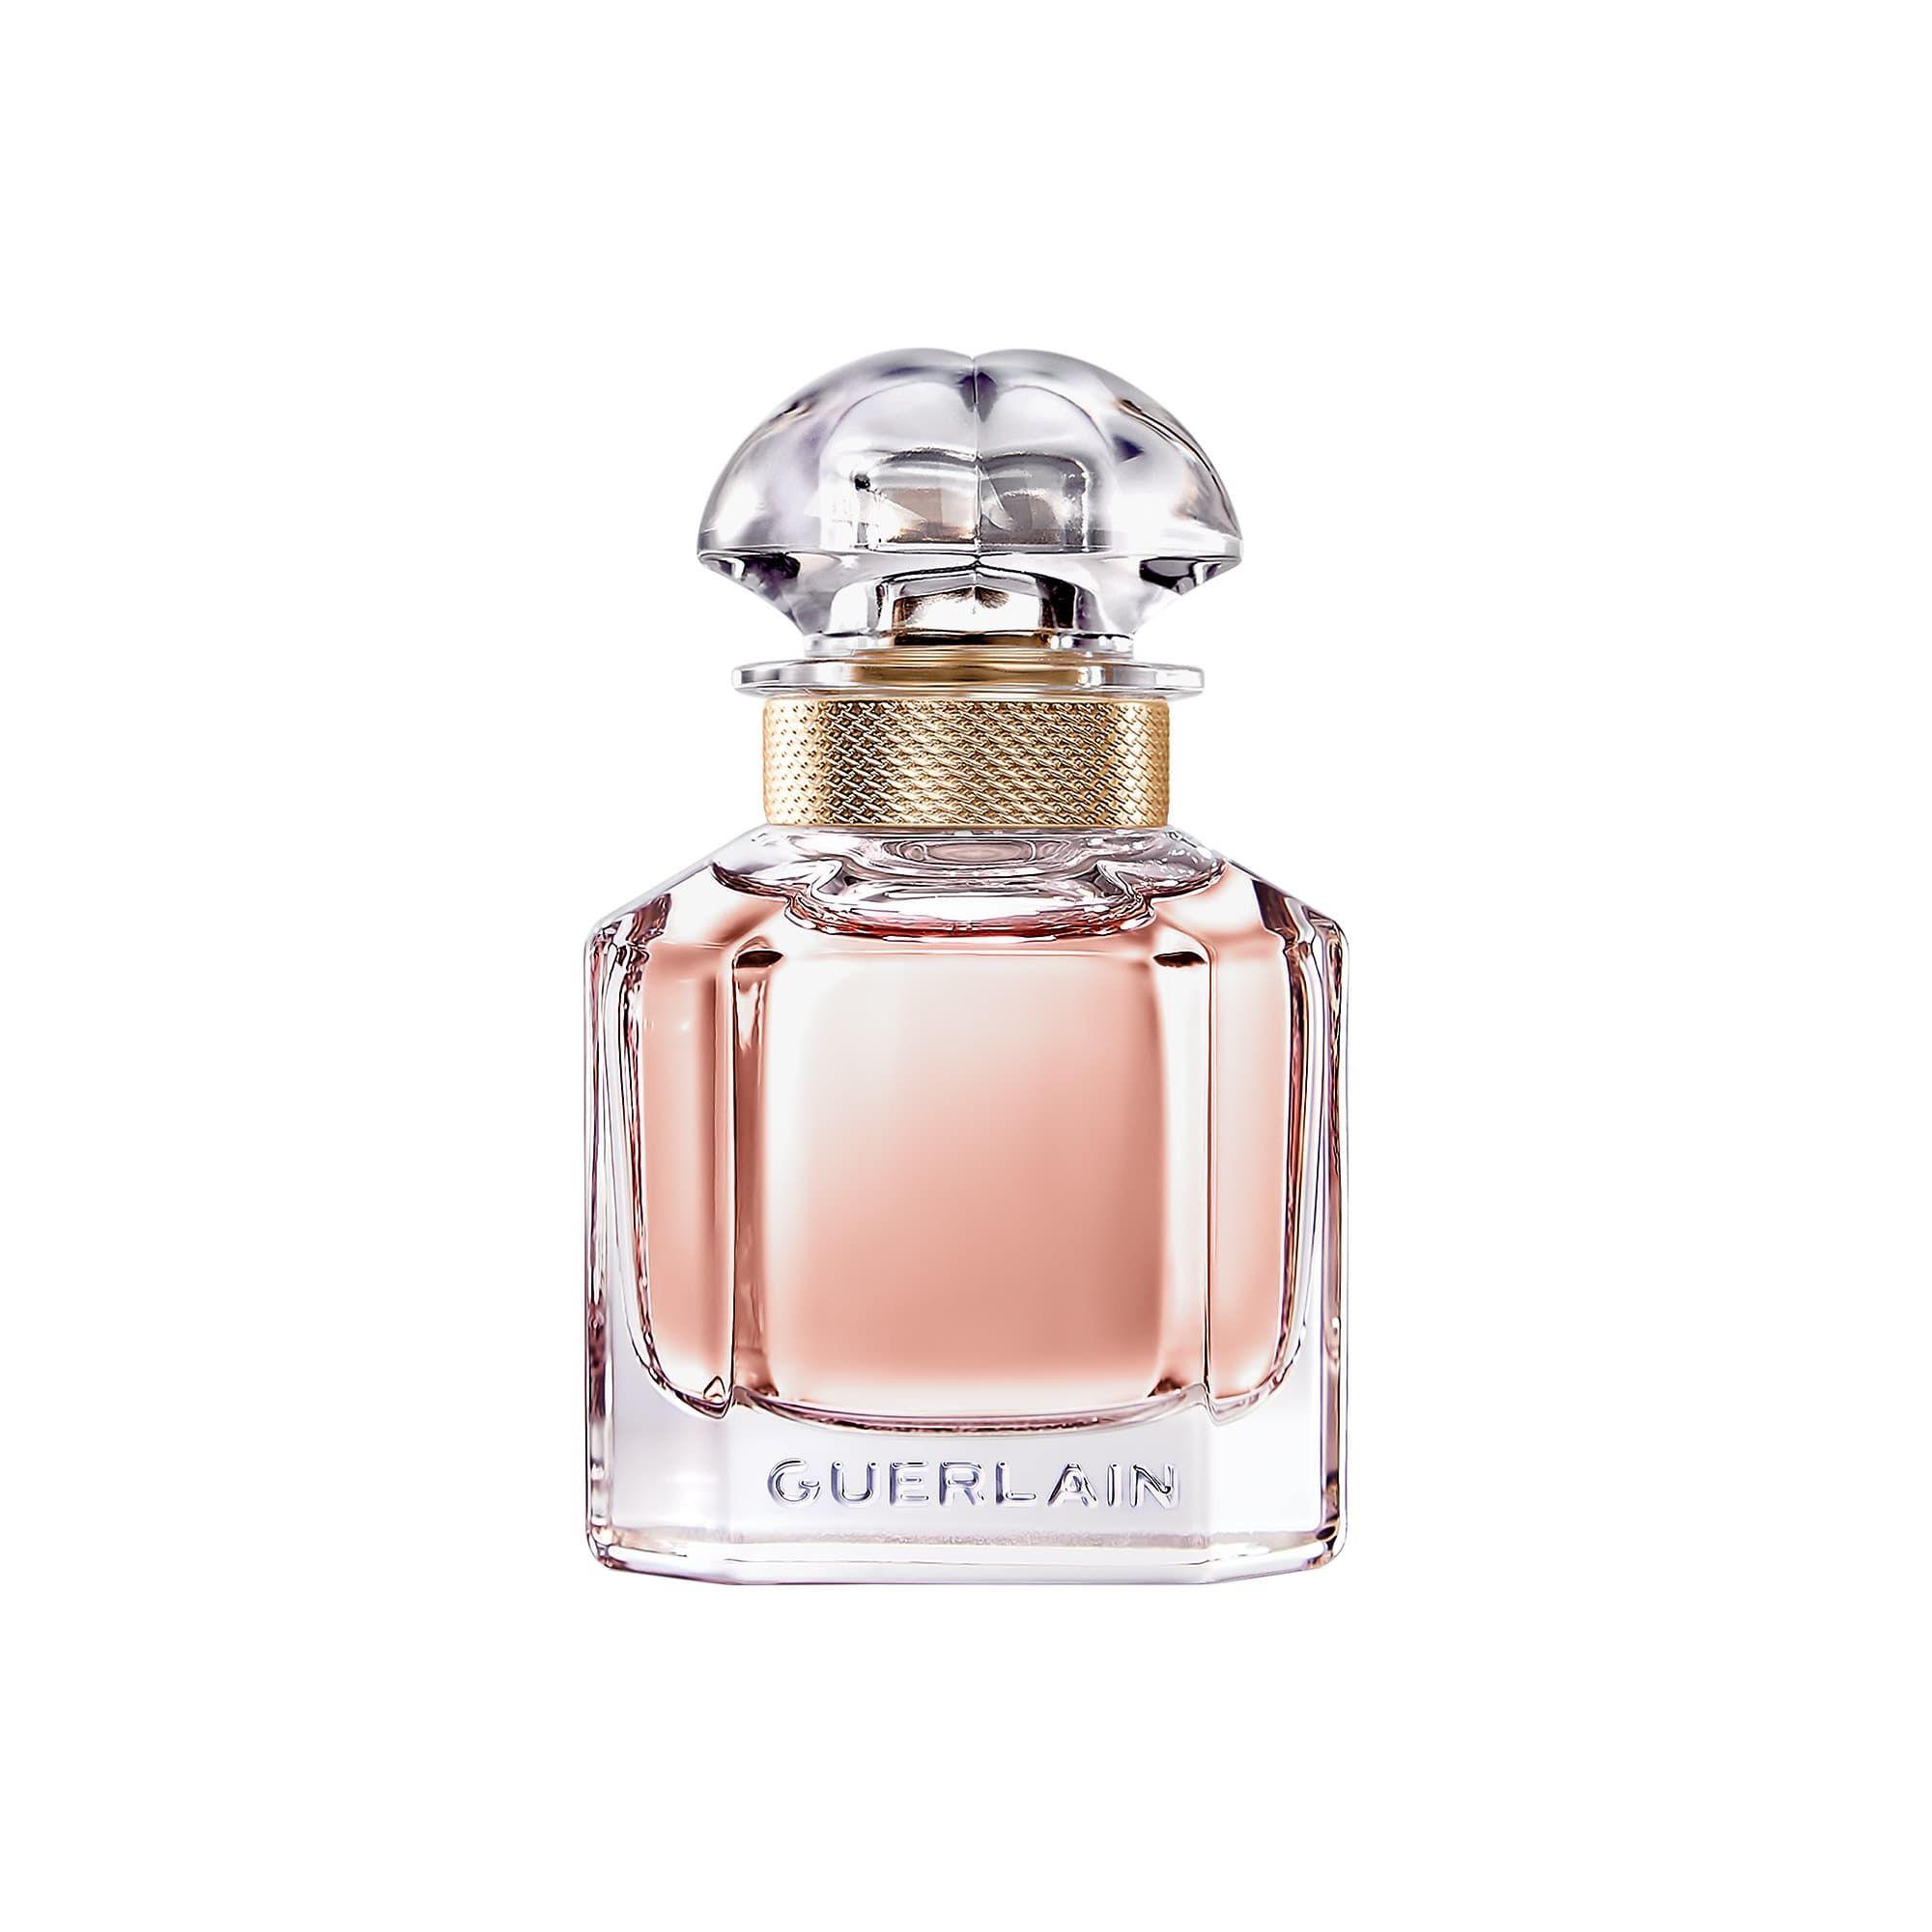 db64c437277 Guerlain Mon Guerlain 1.0 oz  30 mL Eau de Parfum Spray